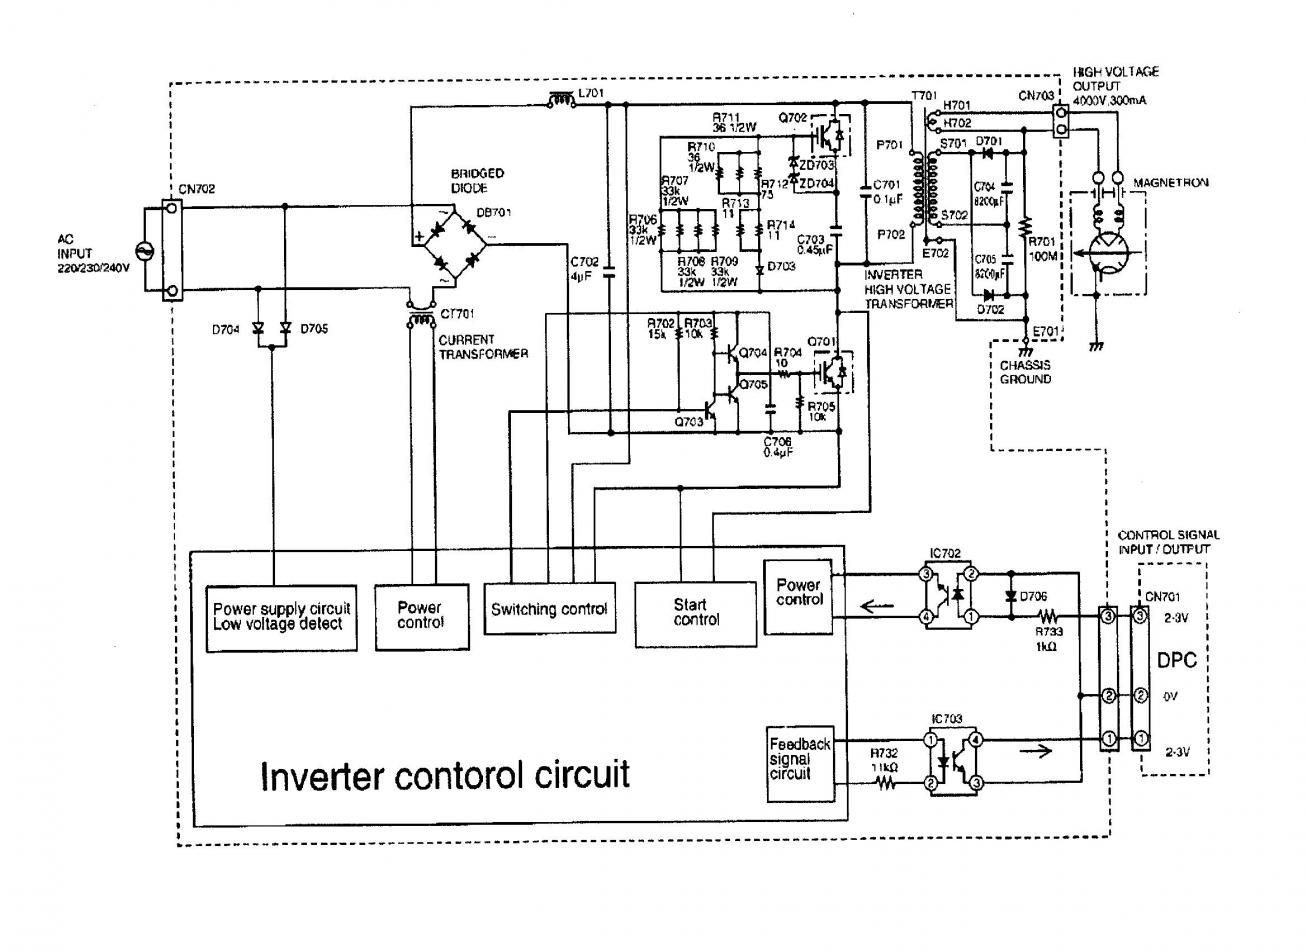 small resolution of panasonic microwave schematic diagram wiring diagram toolbox panasonic microwave oven circuit diagram microwave oven schematic microwave